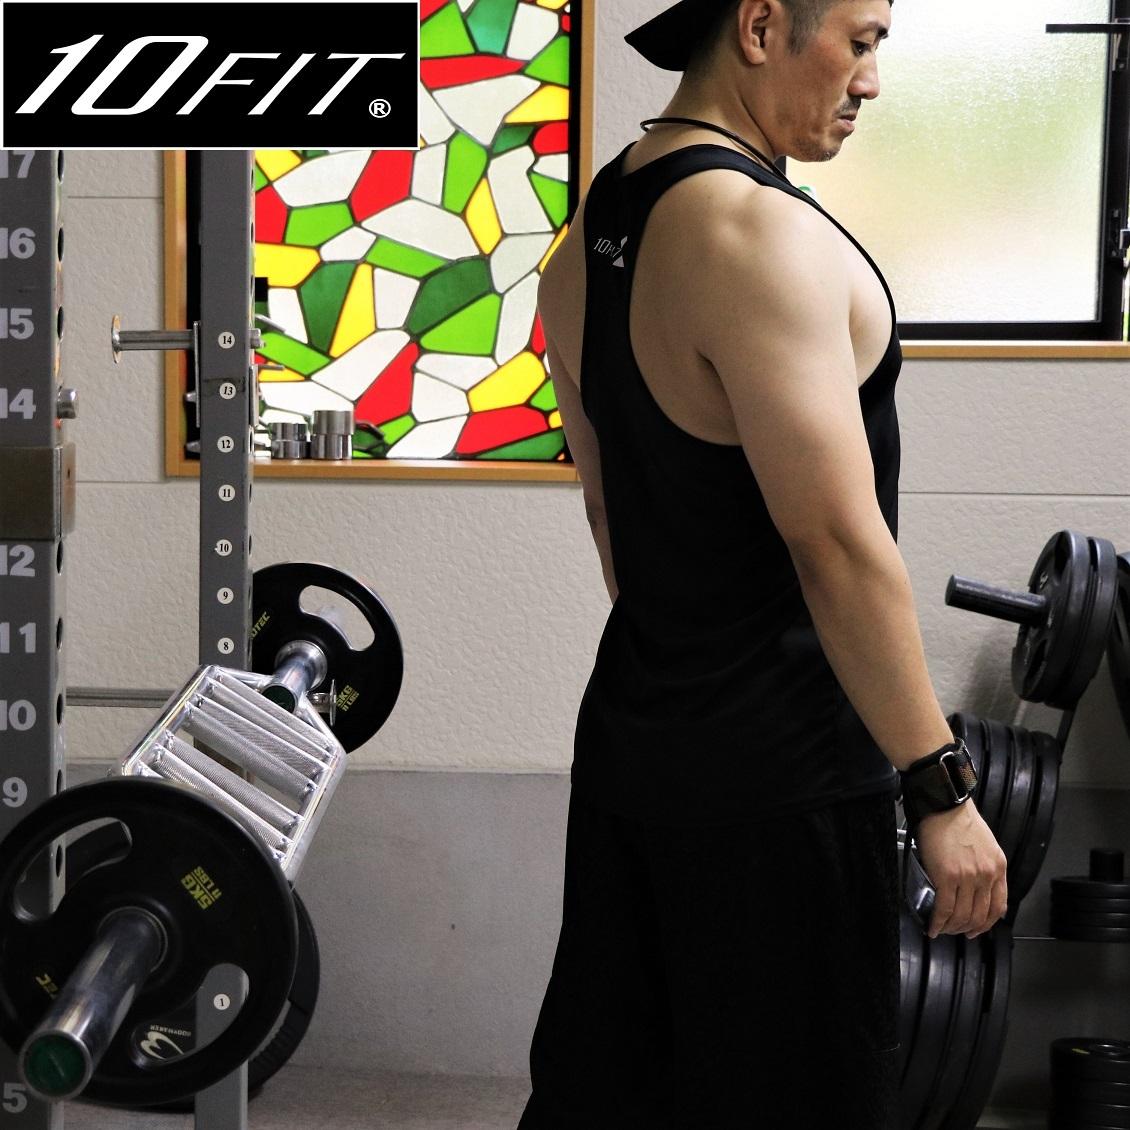 10FIT ストリンガータンクトップ トレーニング 筋トレ ボディビル メンズ TE-04 黒